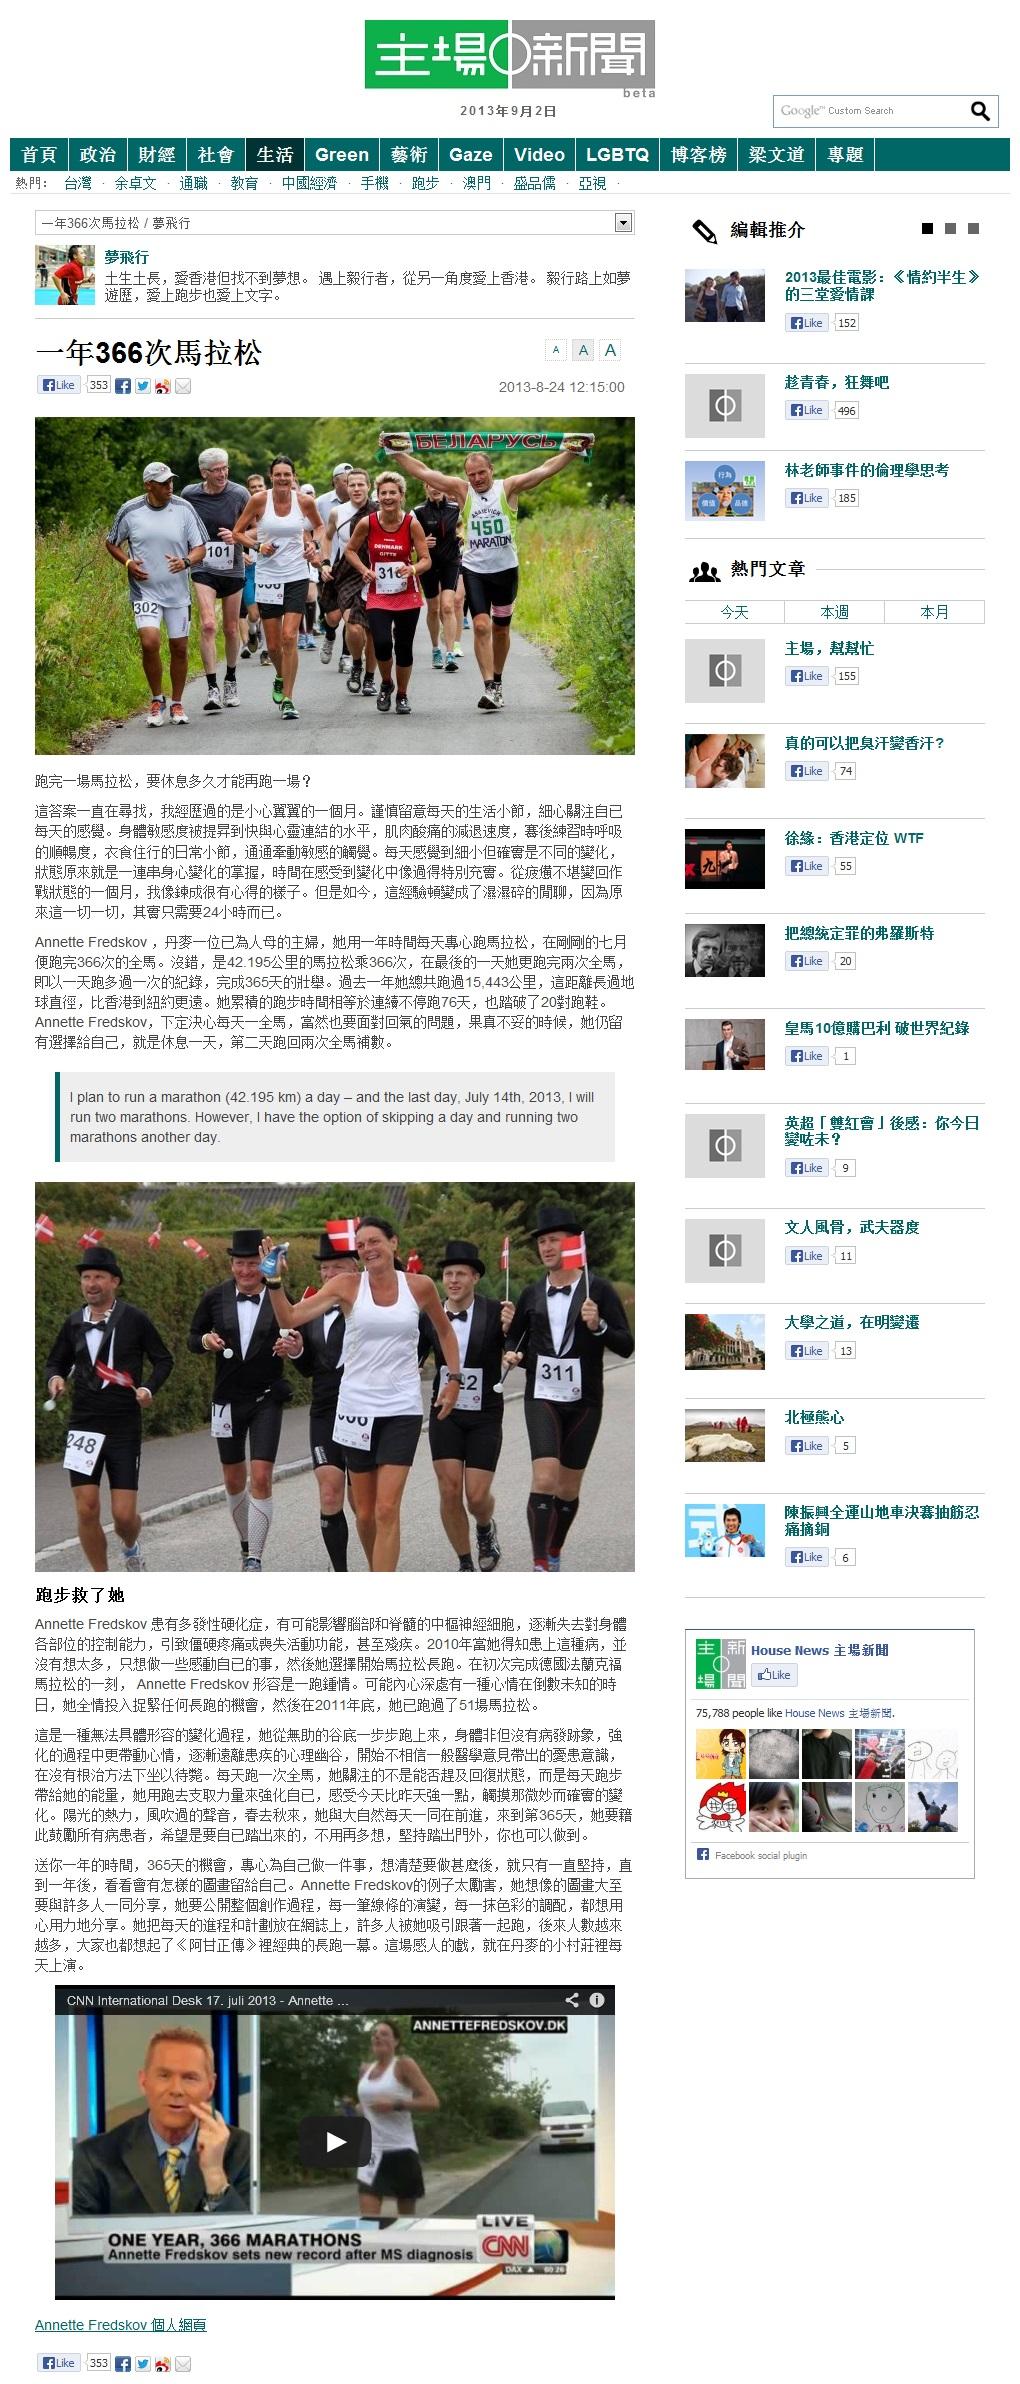 thehousenews.com 2013.08.24 kinesisk